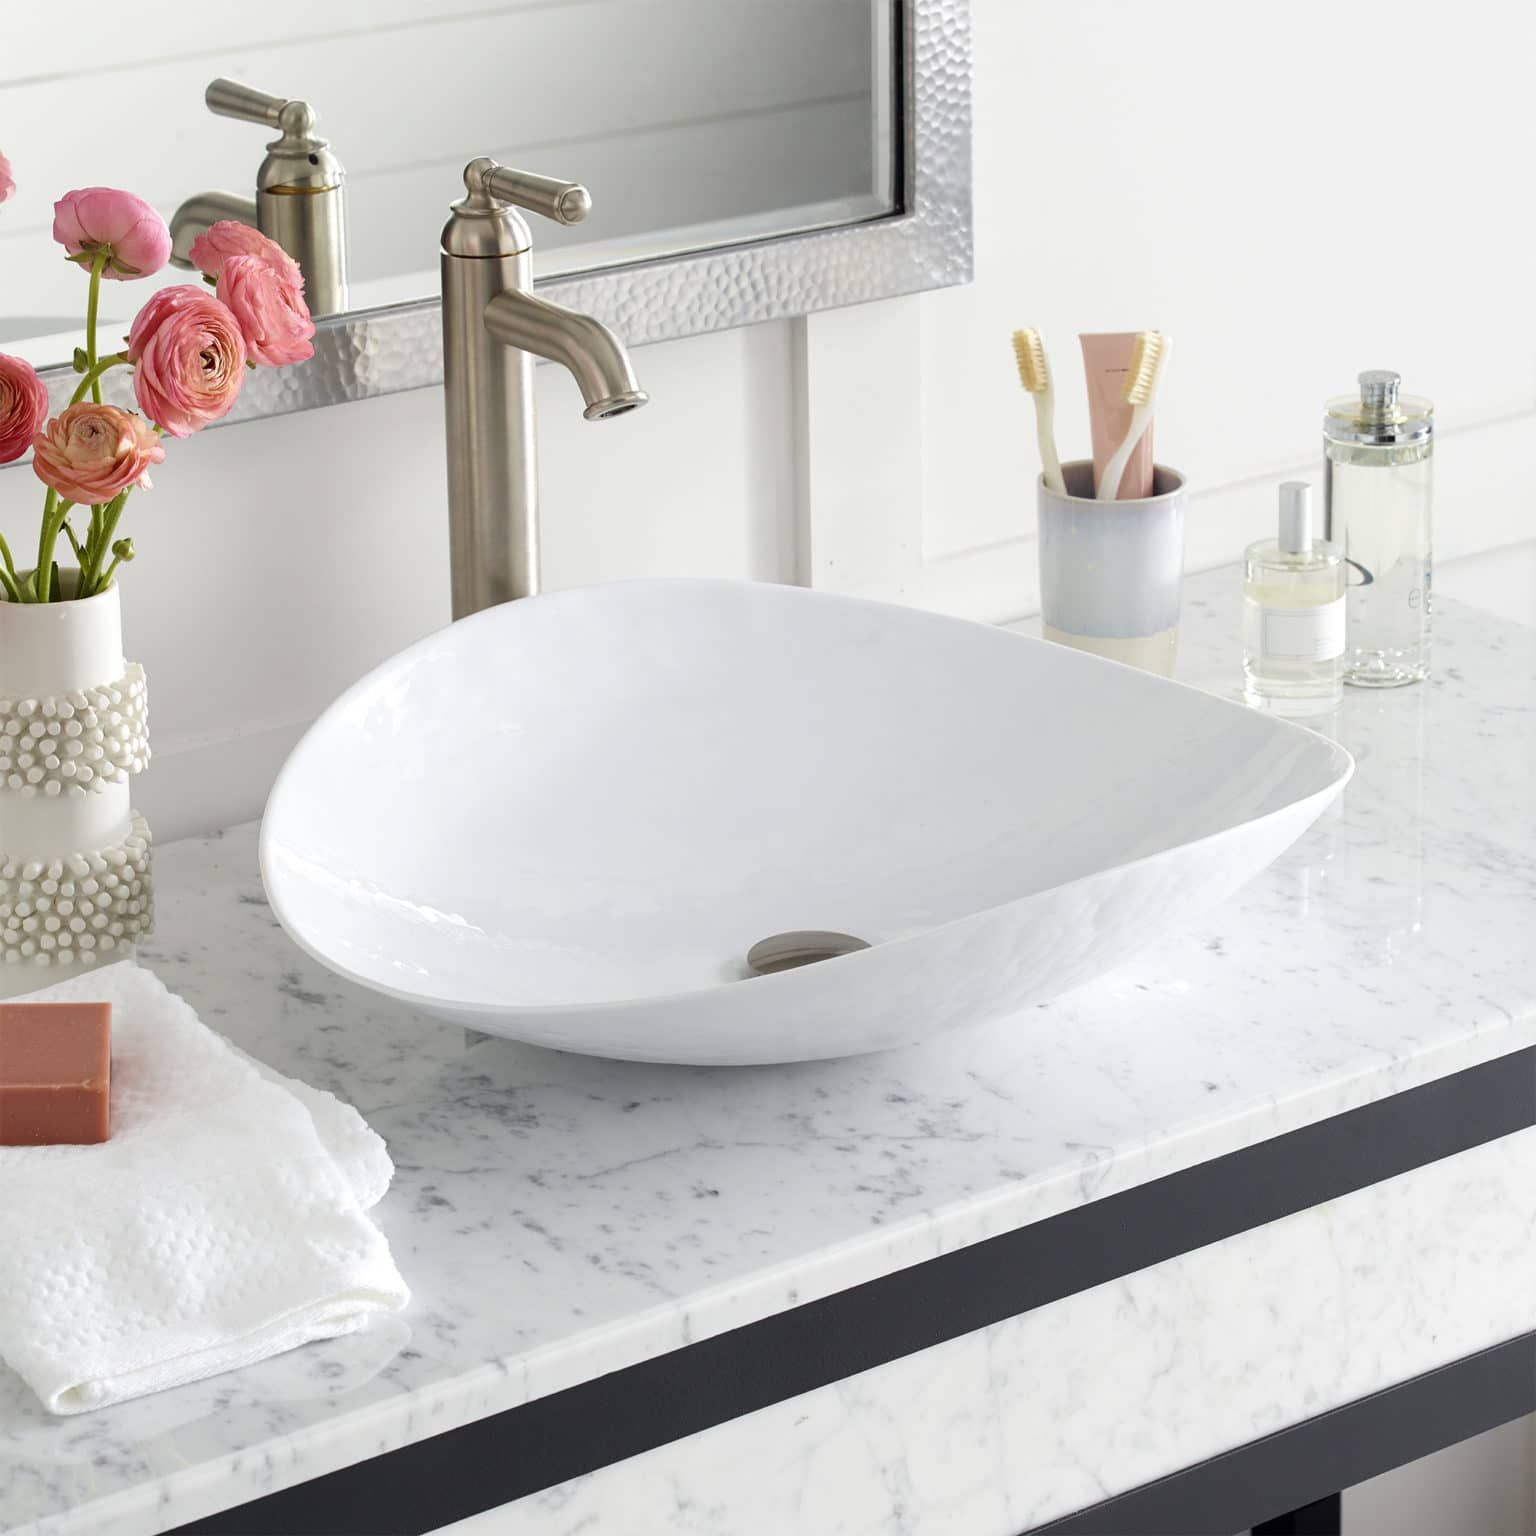 Sorrento Glass Vessel Bathroom Sink Native Trails In 2020 Glass Bathroom Sink Glass Bathroom Sink